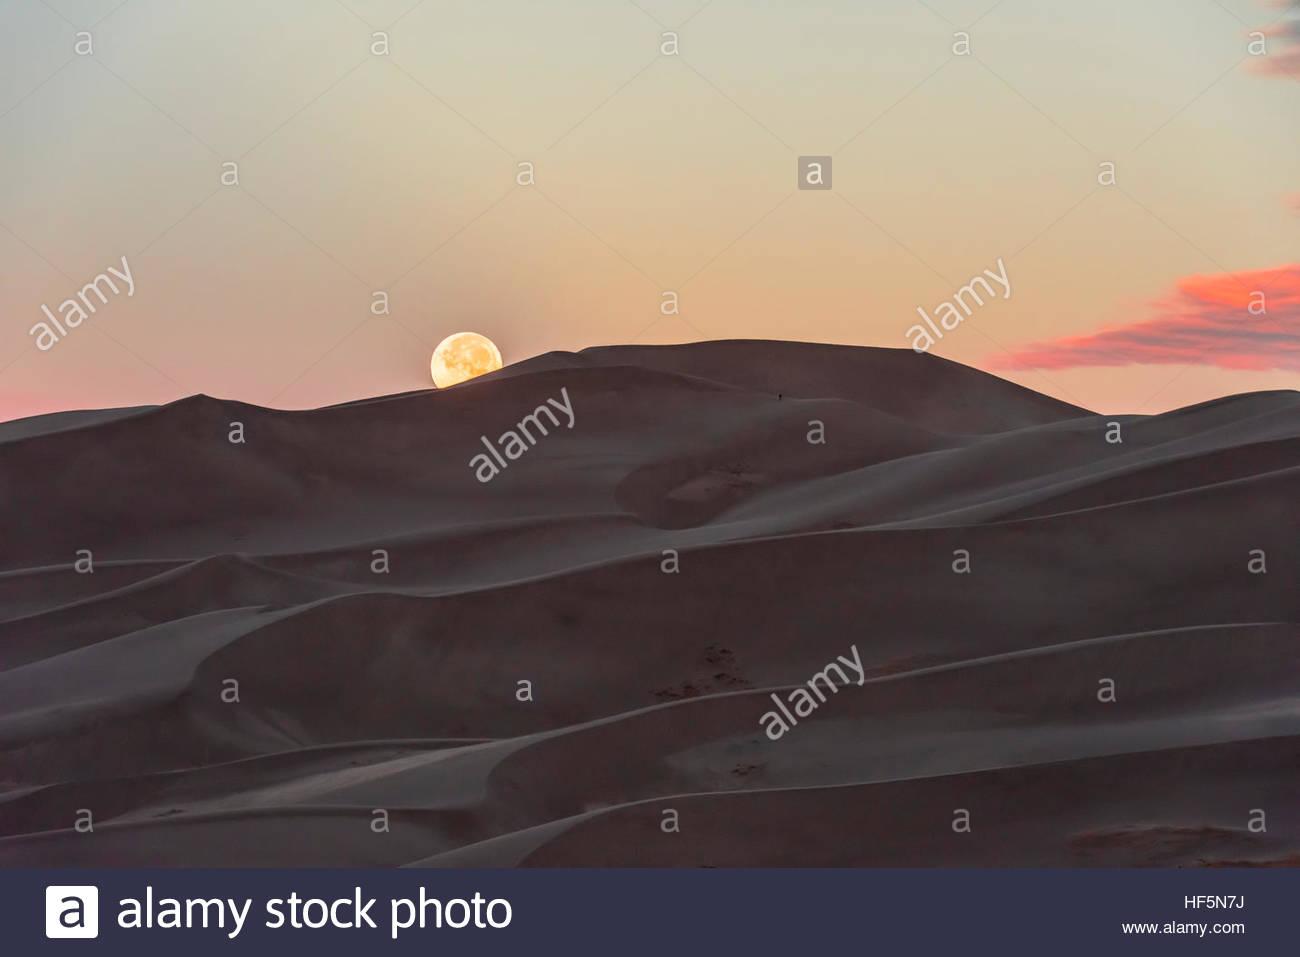 Der Vollmond über den 750 Fuß hohen Sanddünen, Great Sand Dunes National Park and Preserve, in der Stockbild